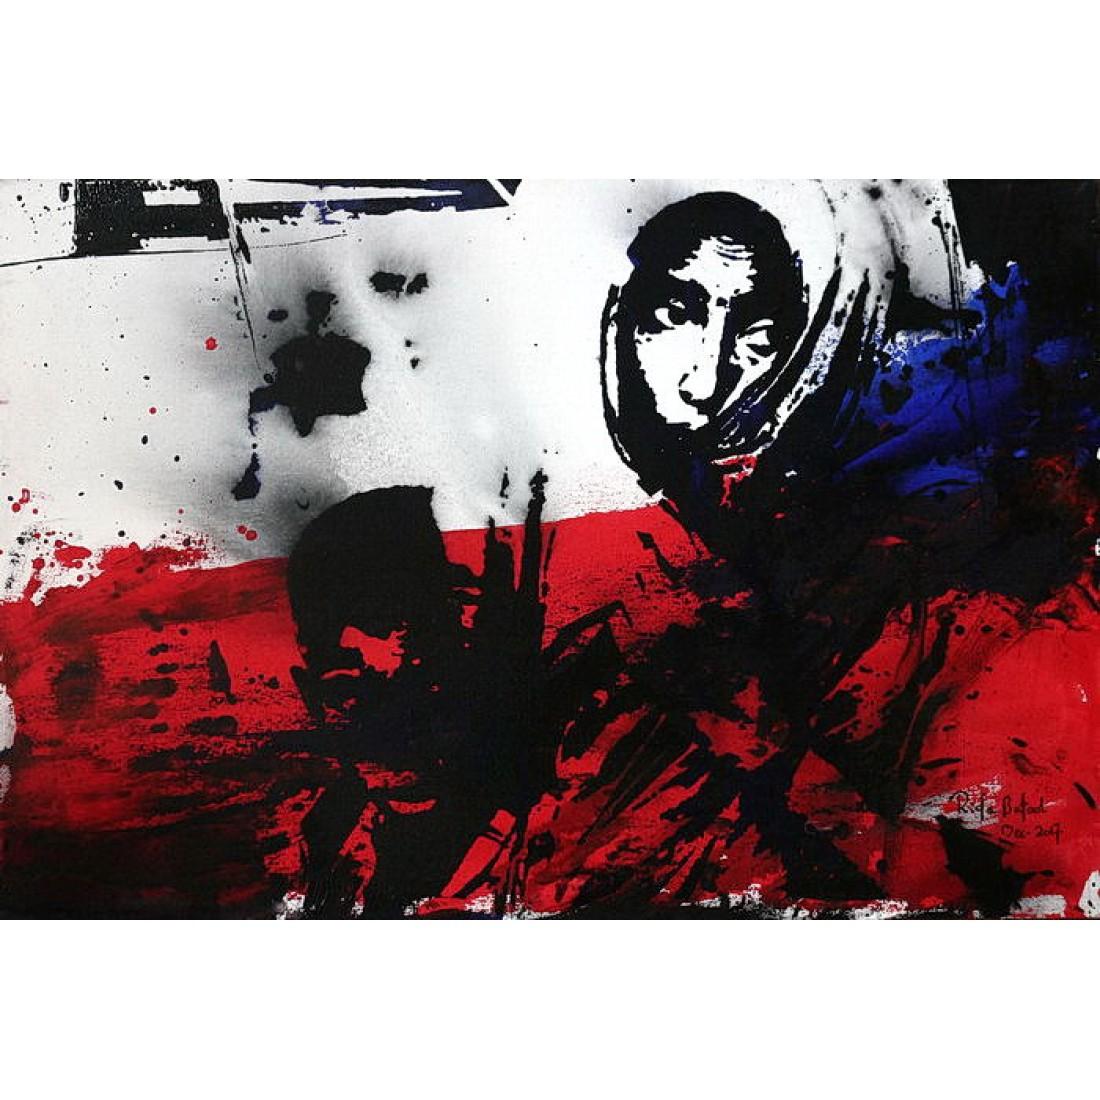 rida kazmi the dukei express 20 x 30 inch acrylic on canvas